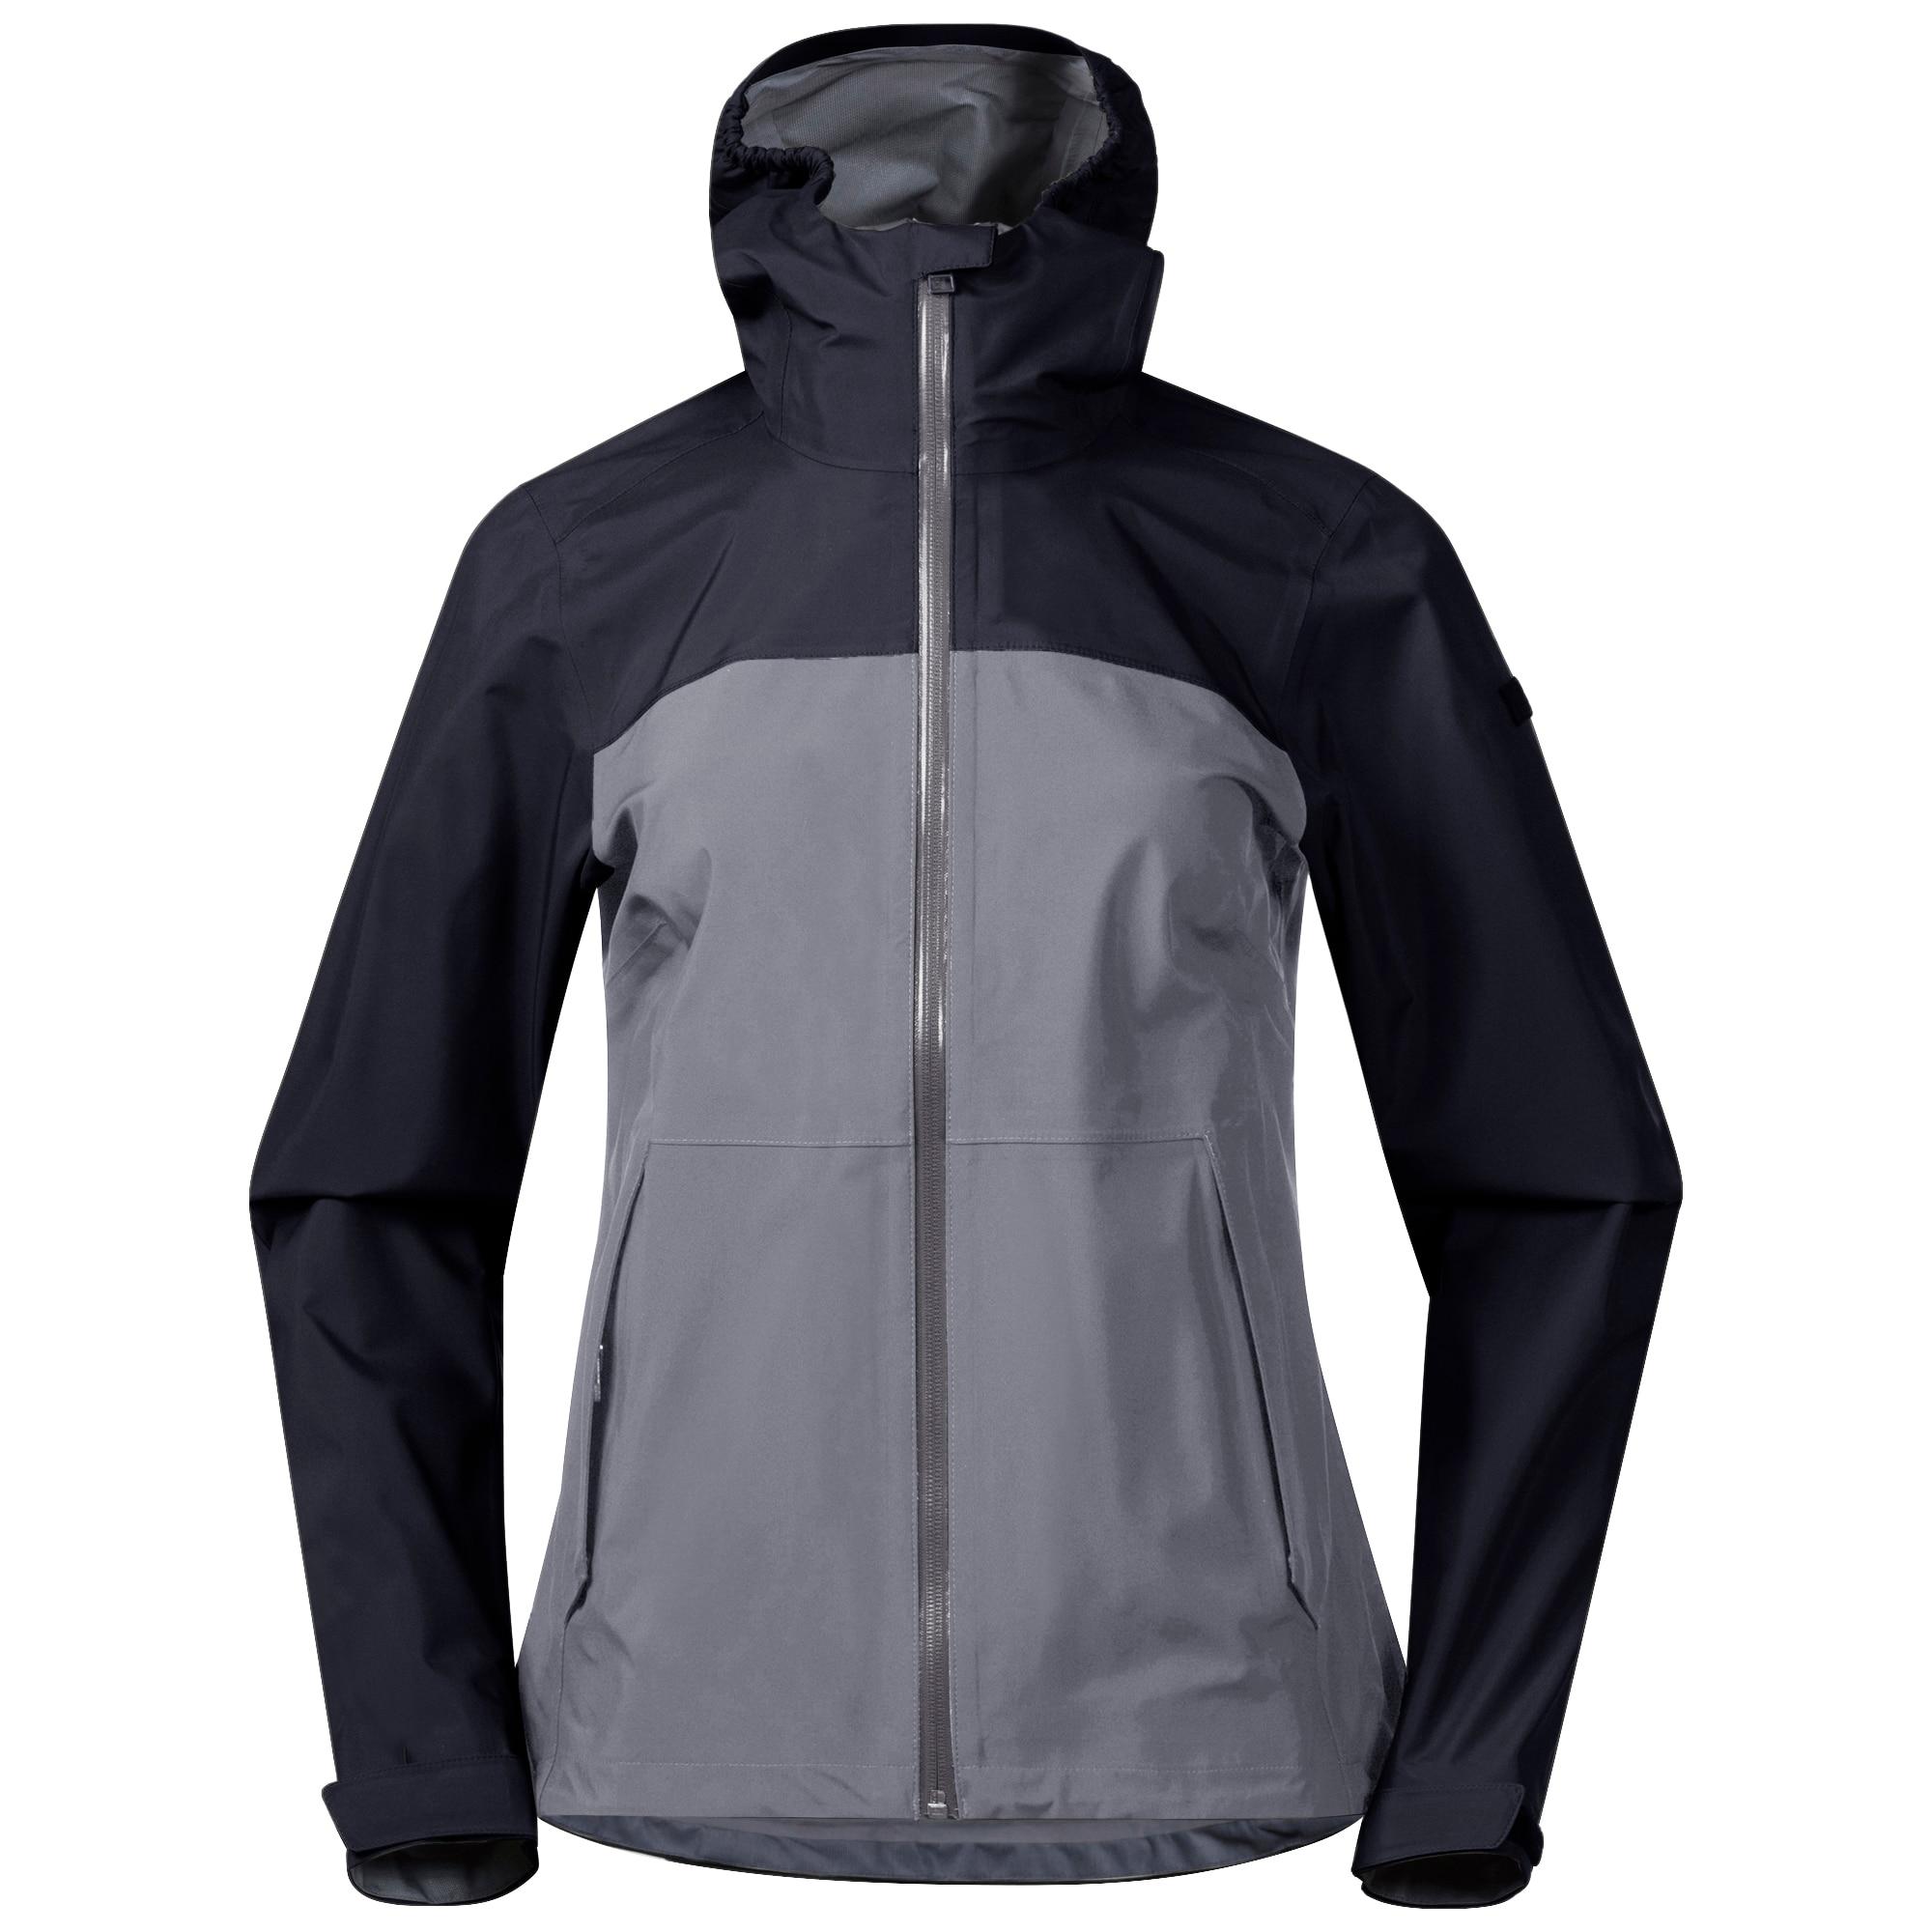 Oslo 3L LT W Jacket